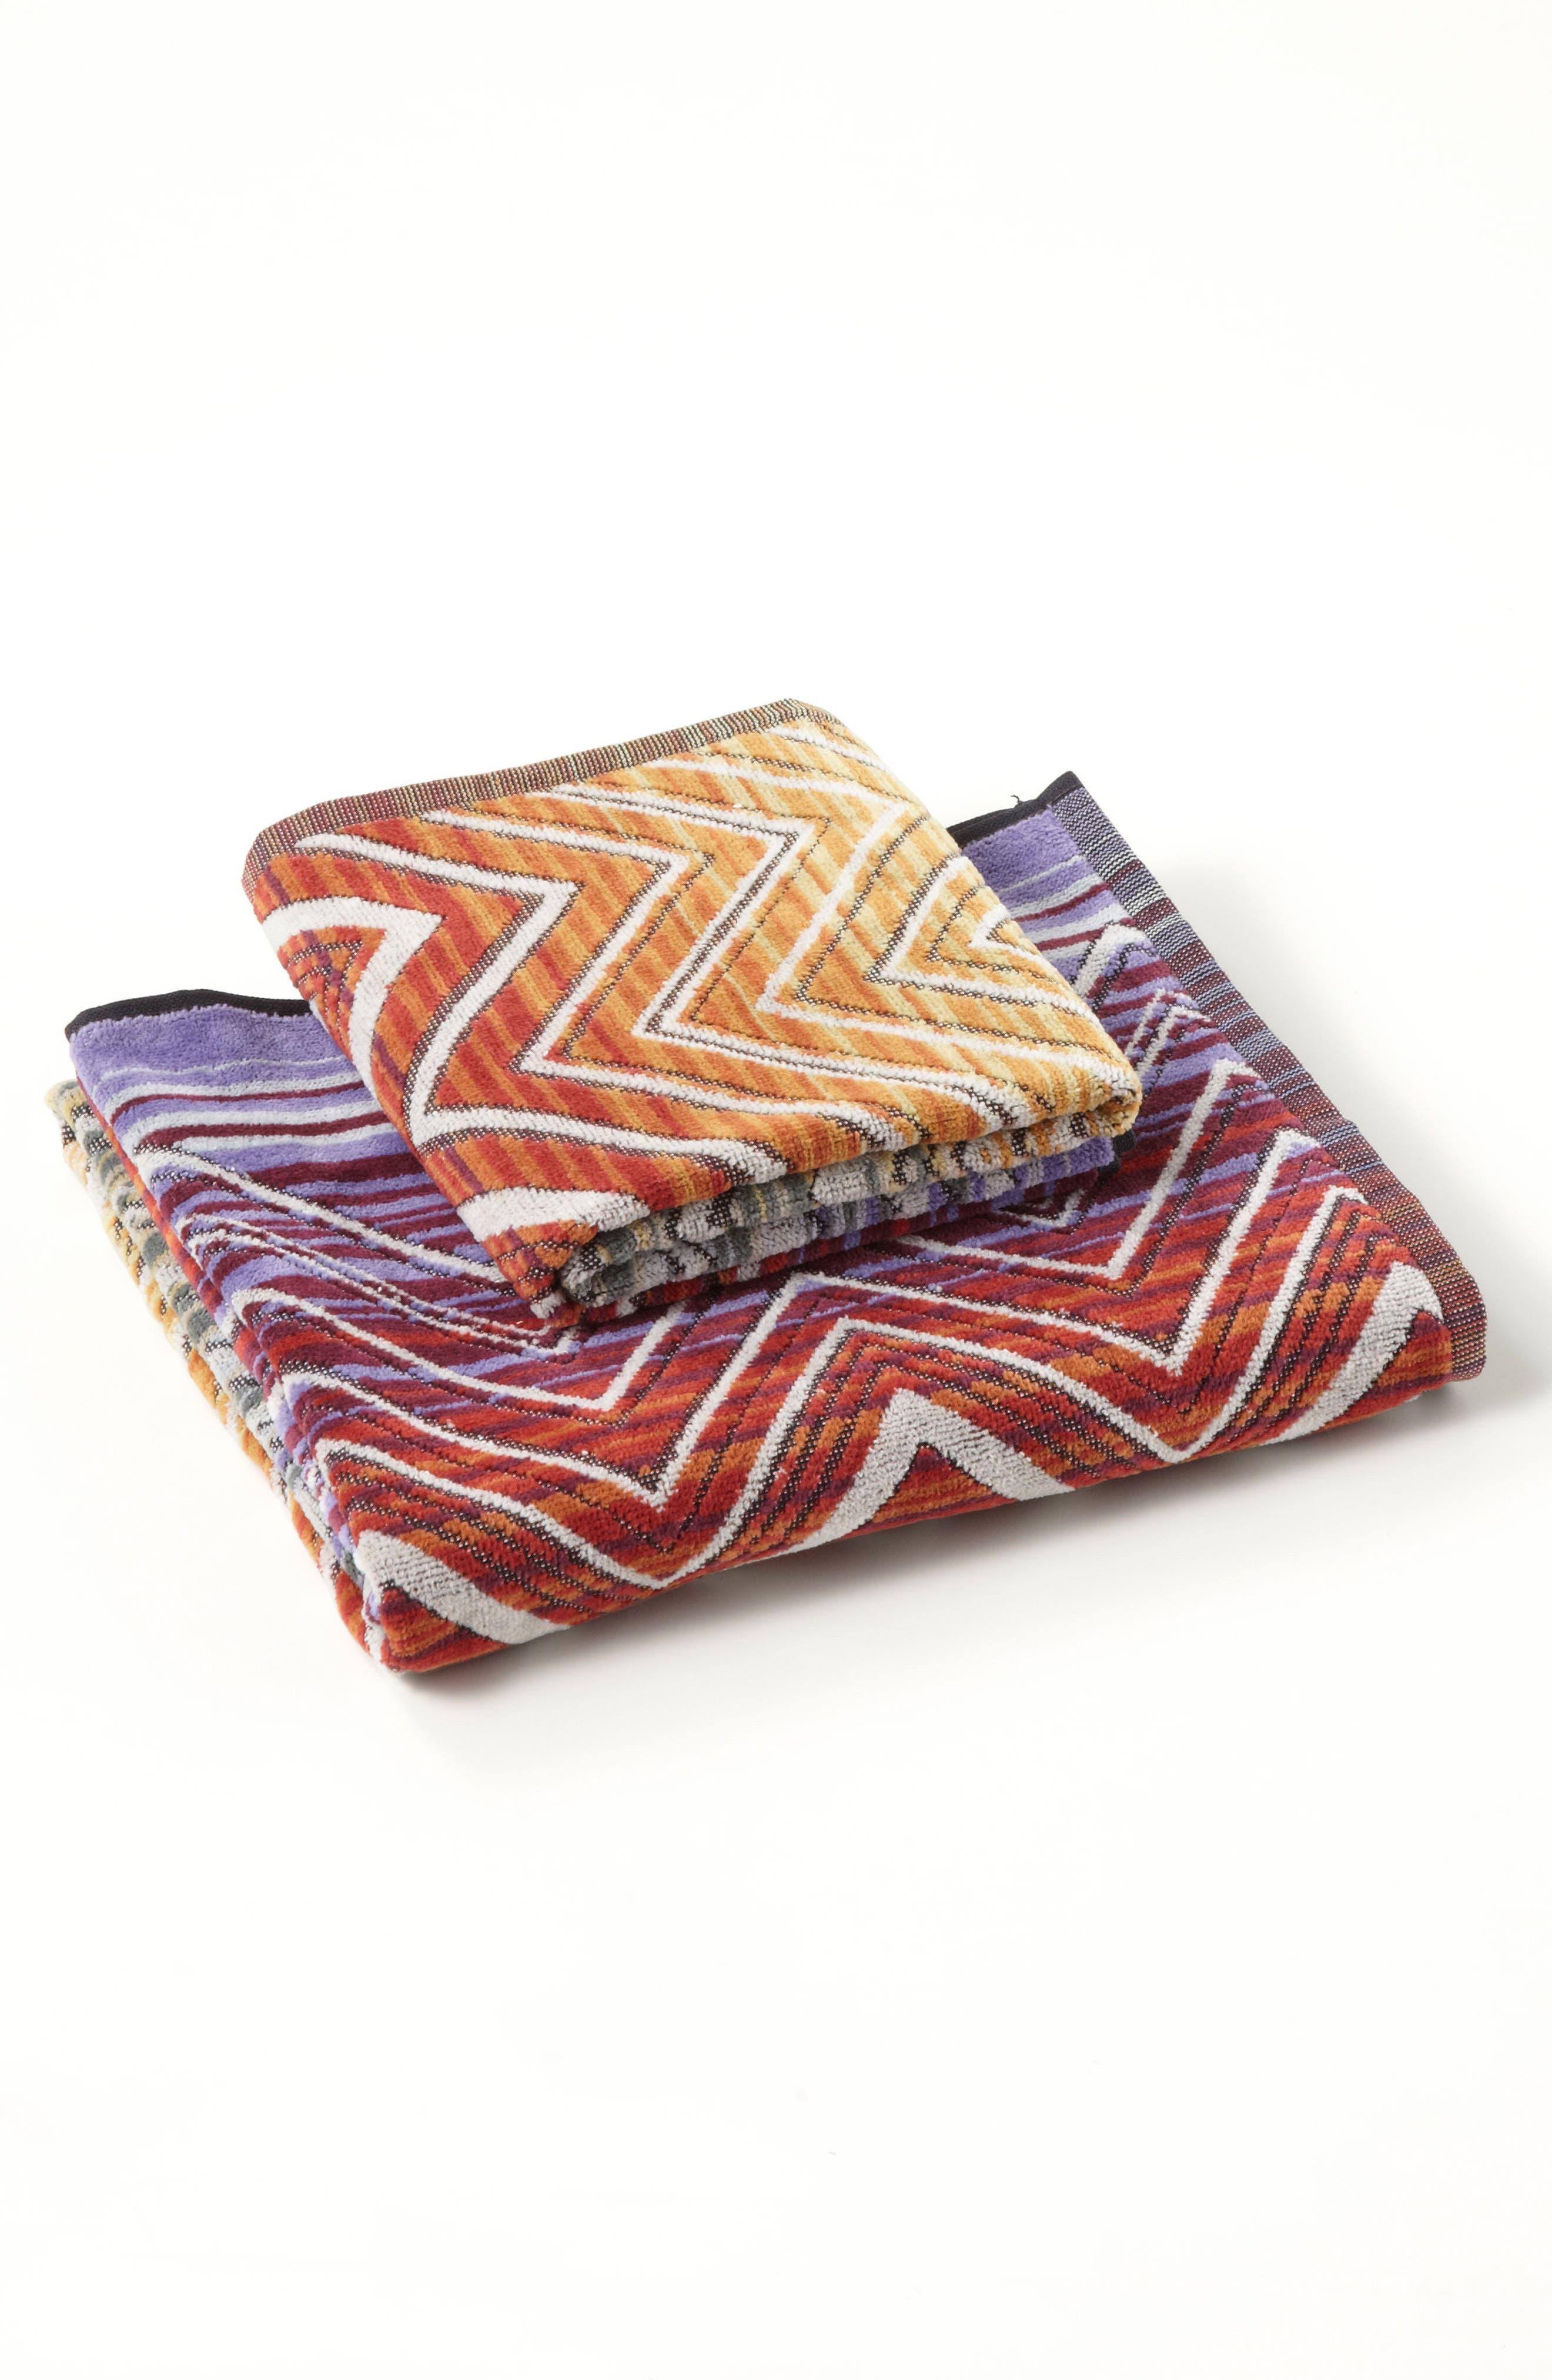 Tolomeo Hand Towel,                             Alternate thumbnail 2, color,                             Multi Red